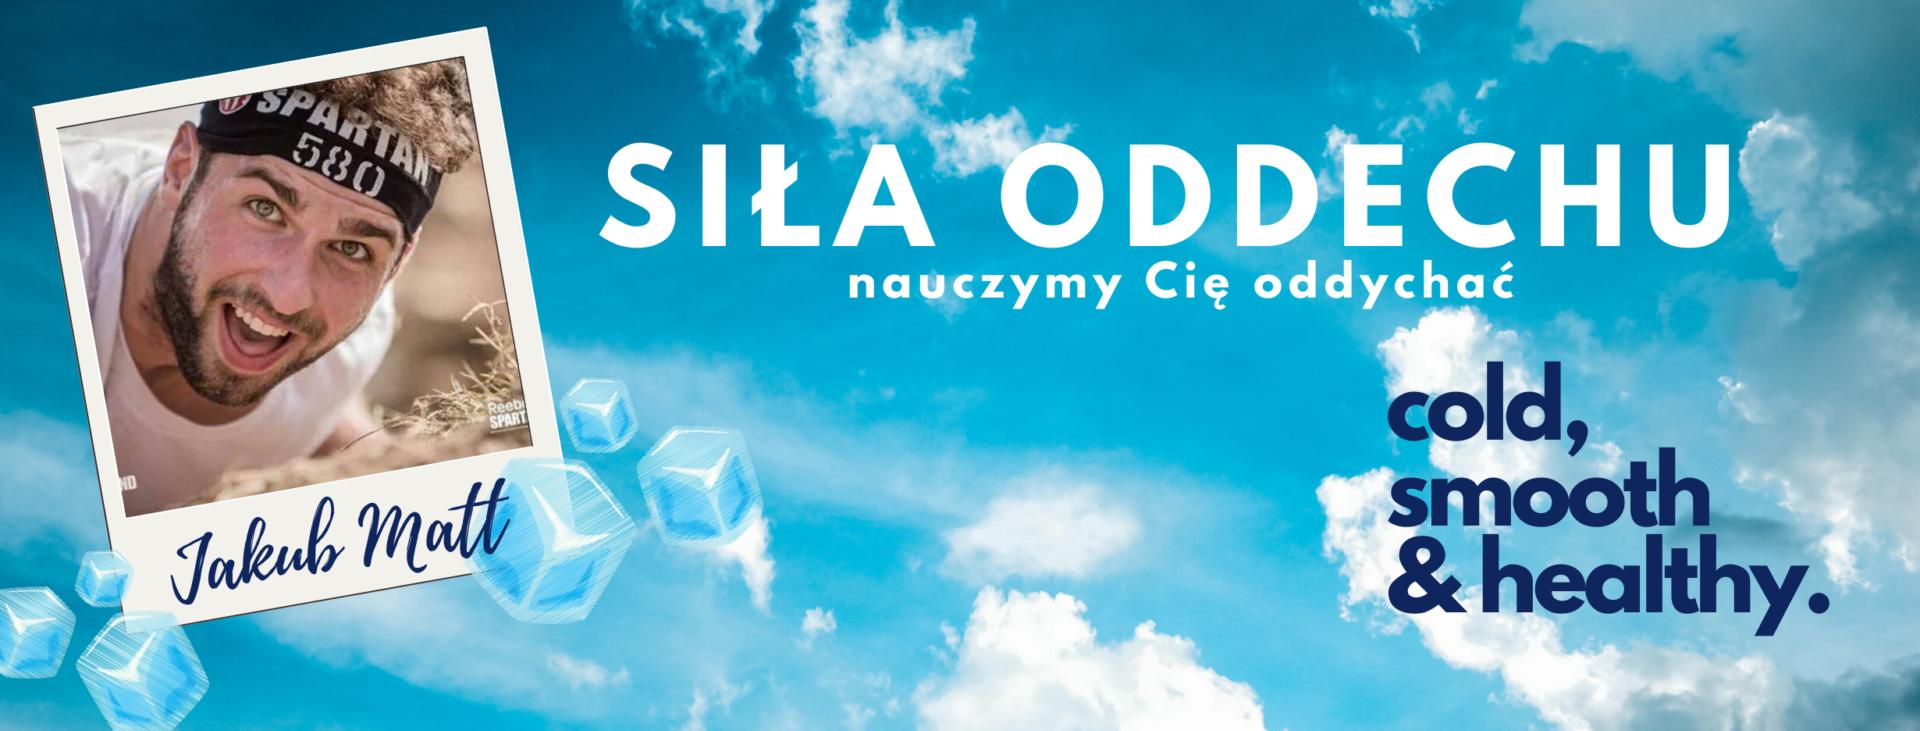 Silaoddechu.pl